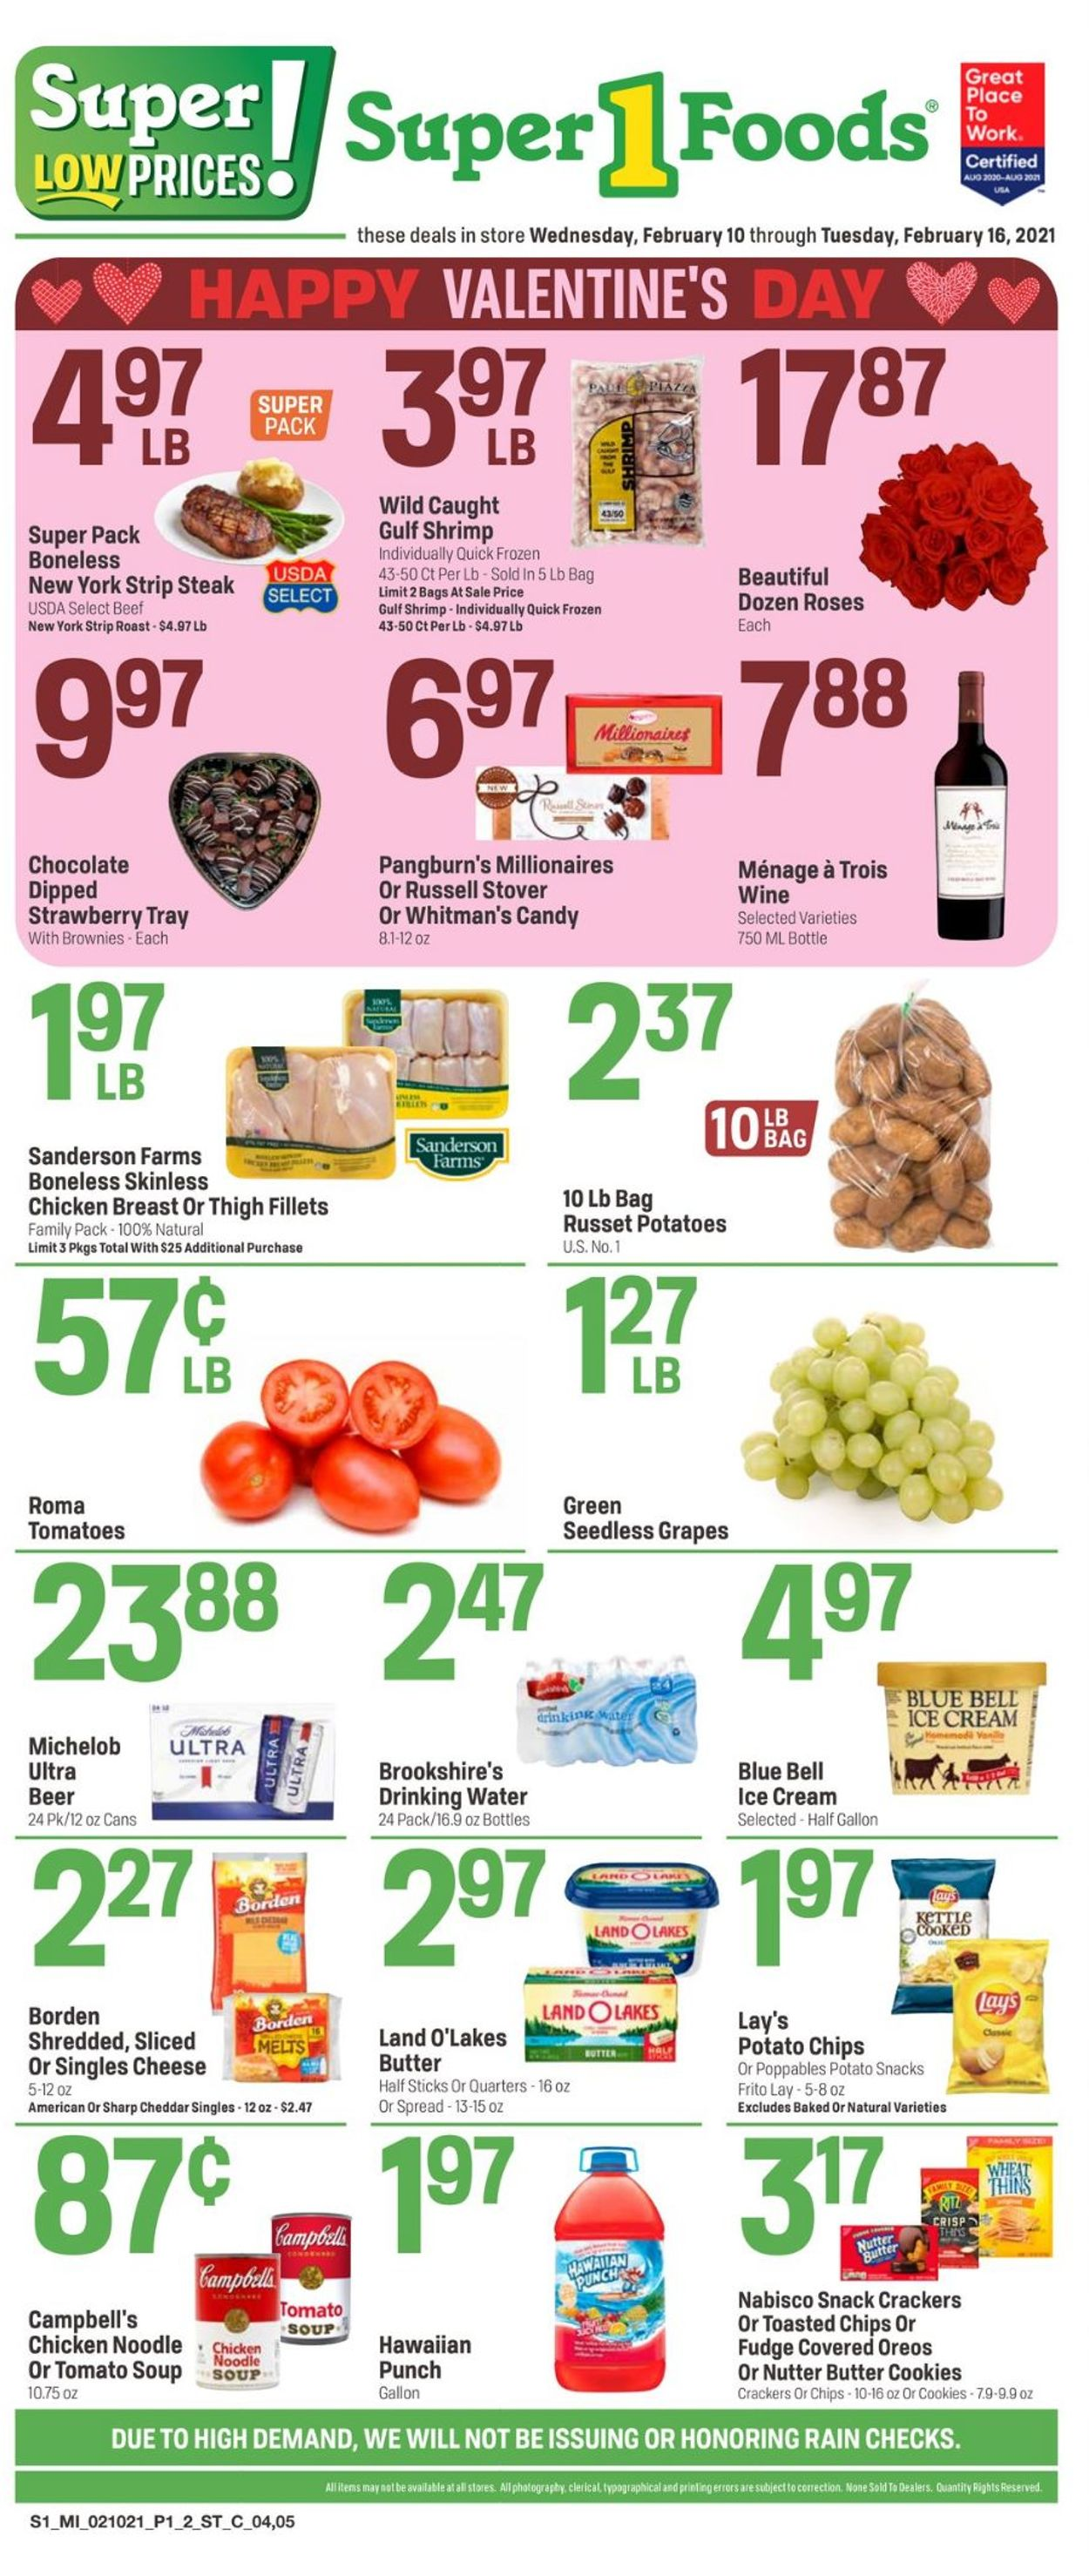 Super 1 Foods Weekly Ad Circular - valid 02/10-02/16/2021